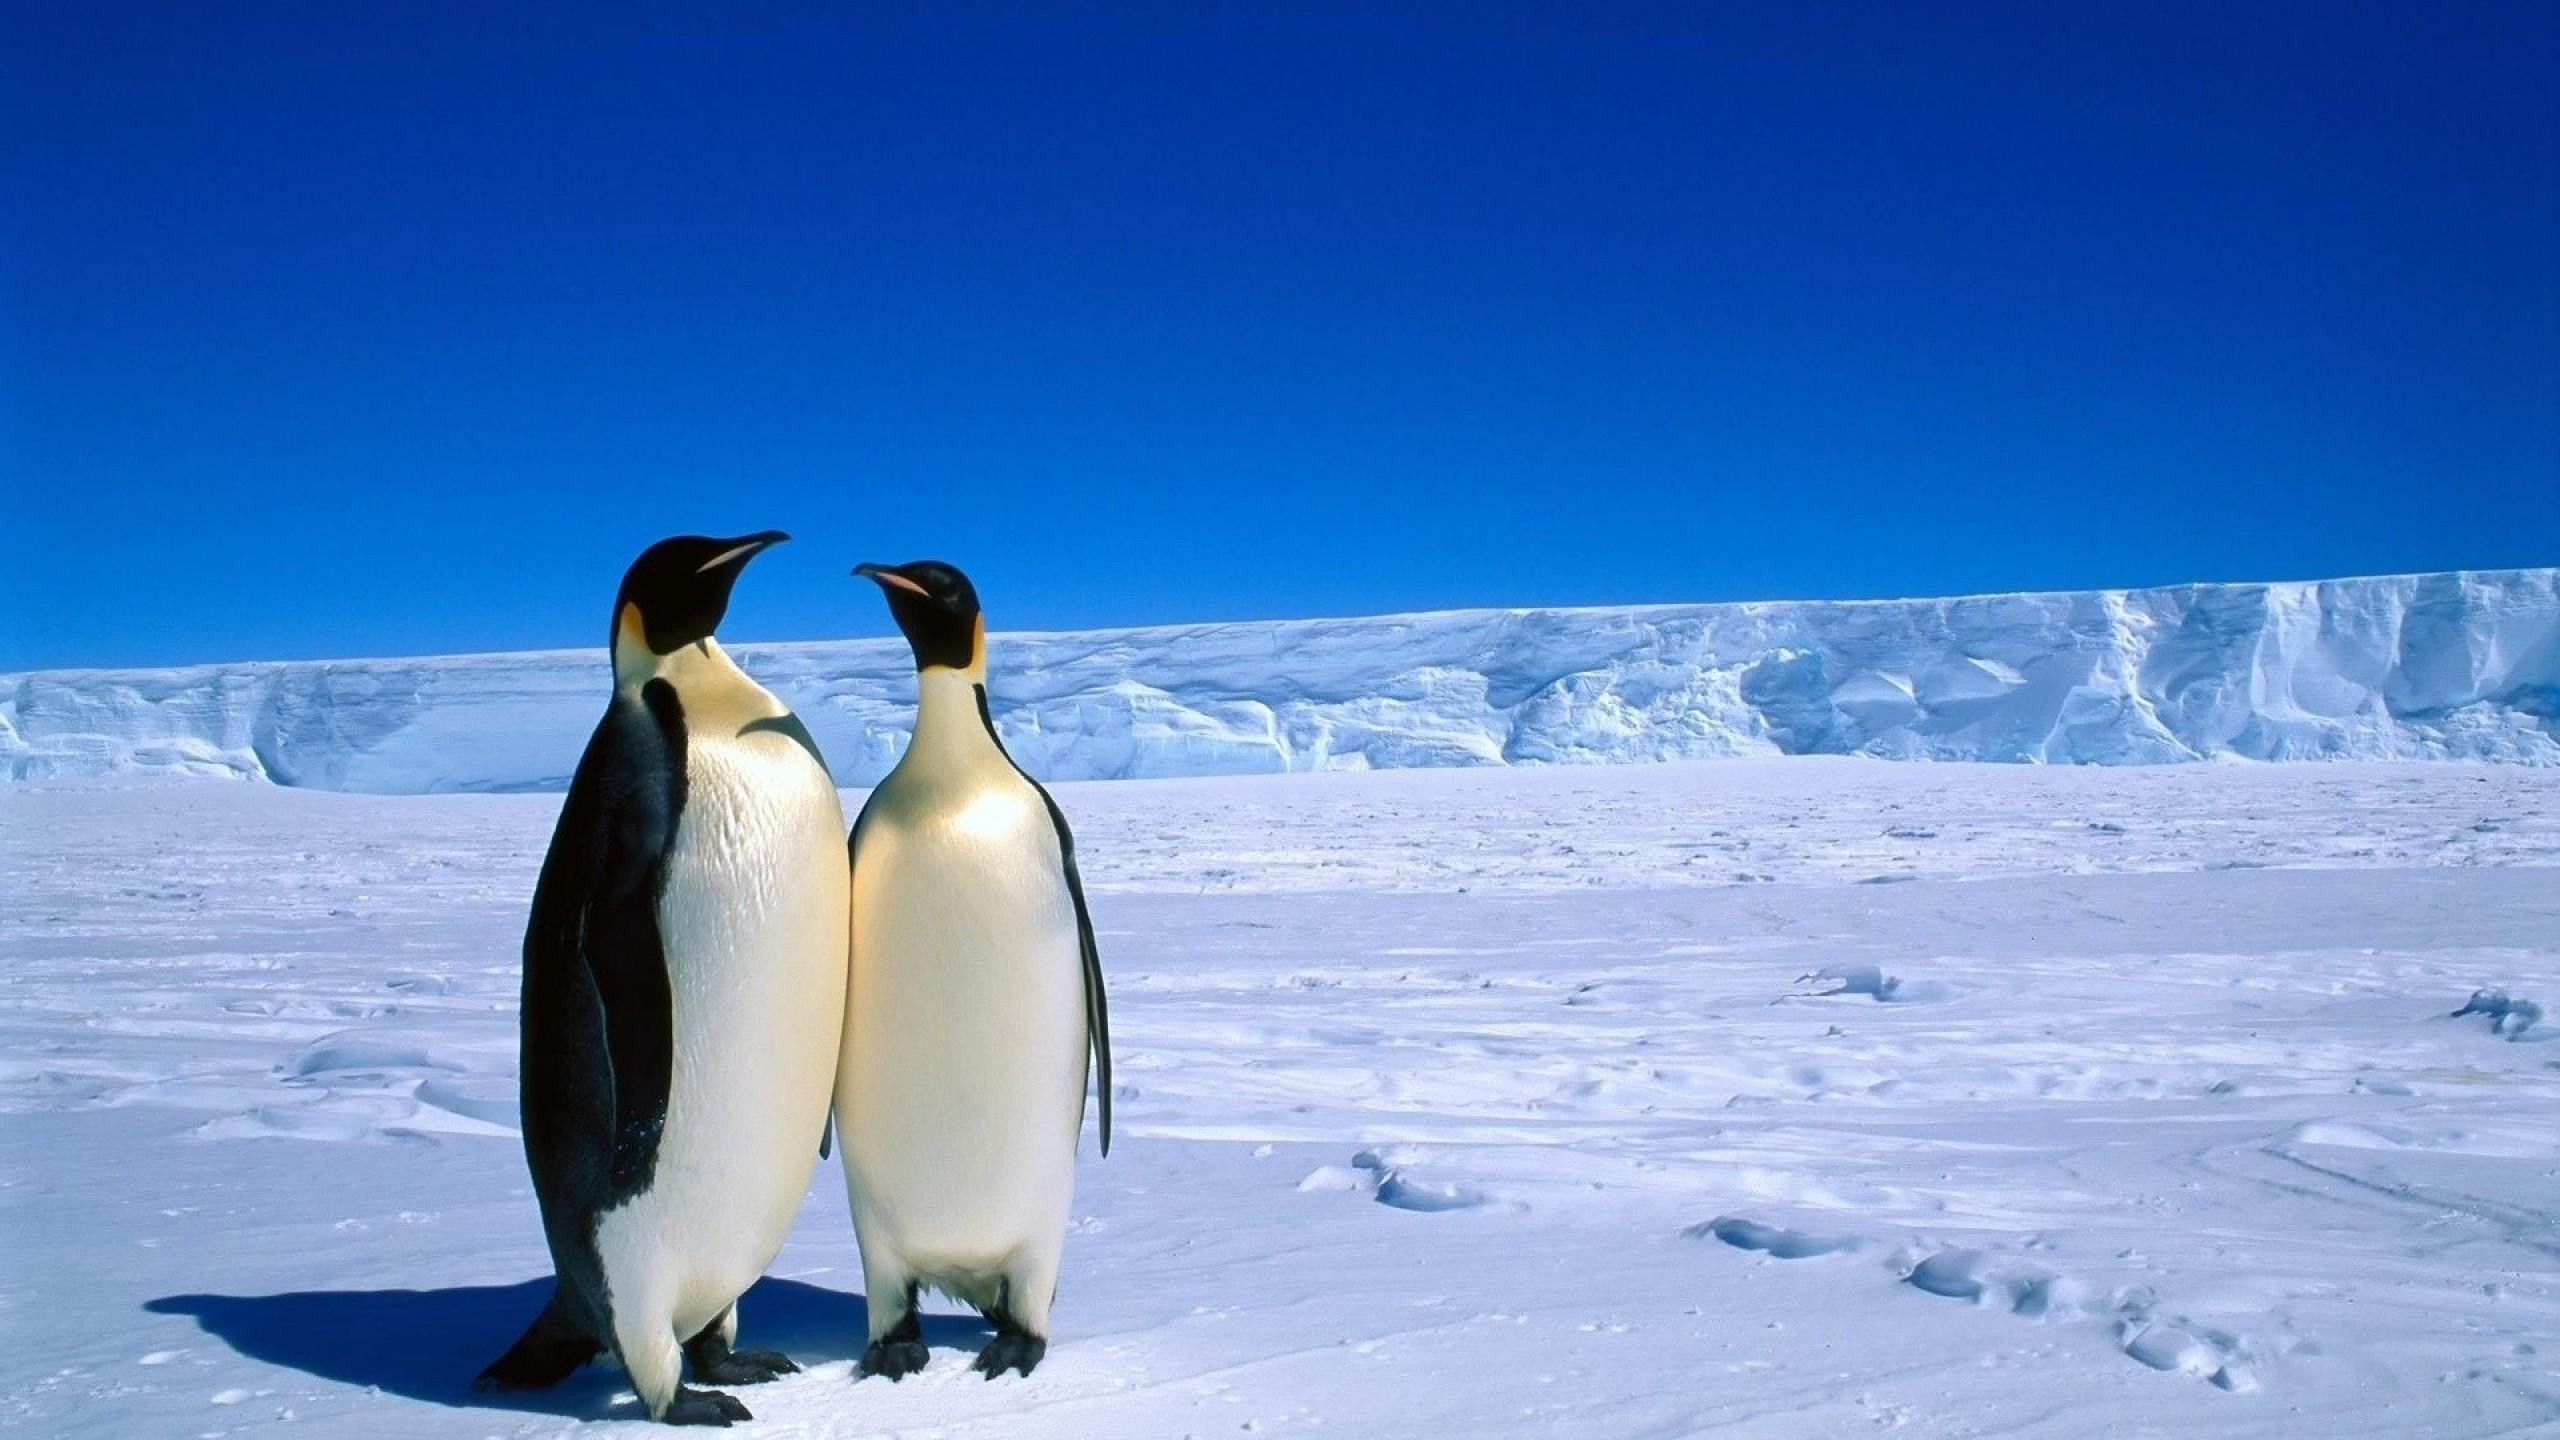 Clip Art Penguins in Antarctica